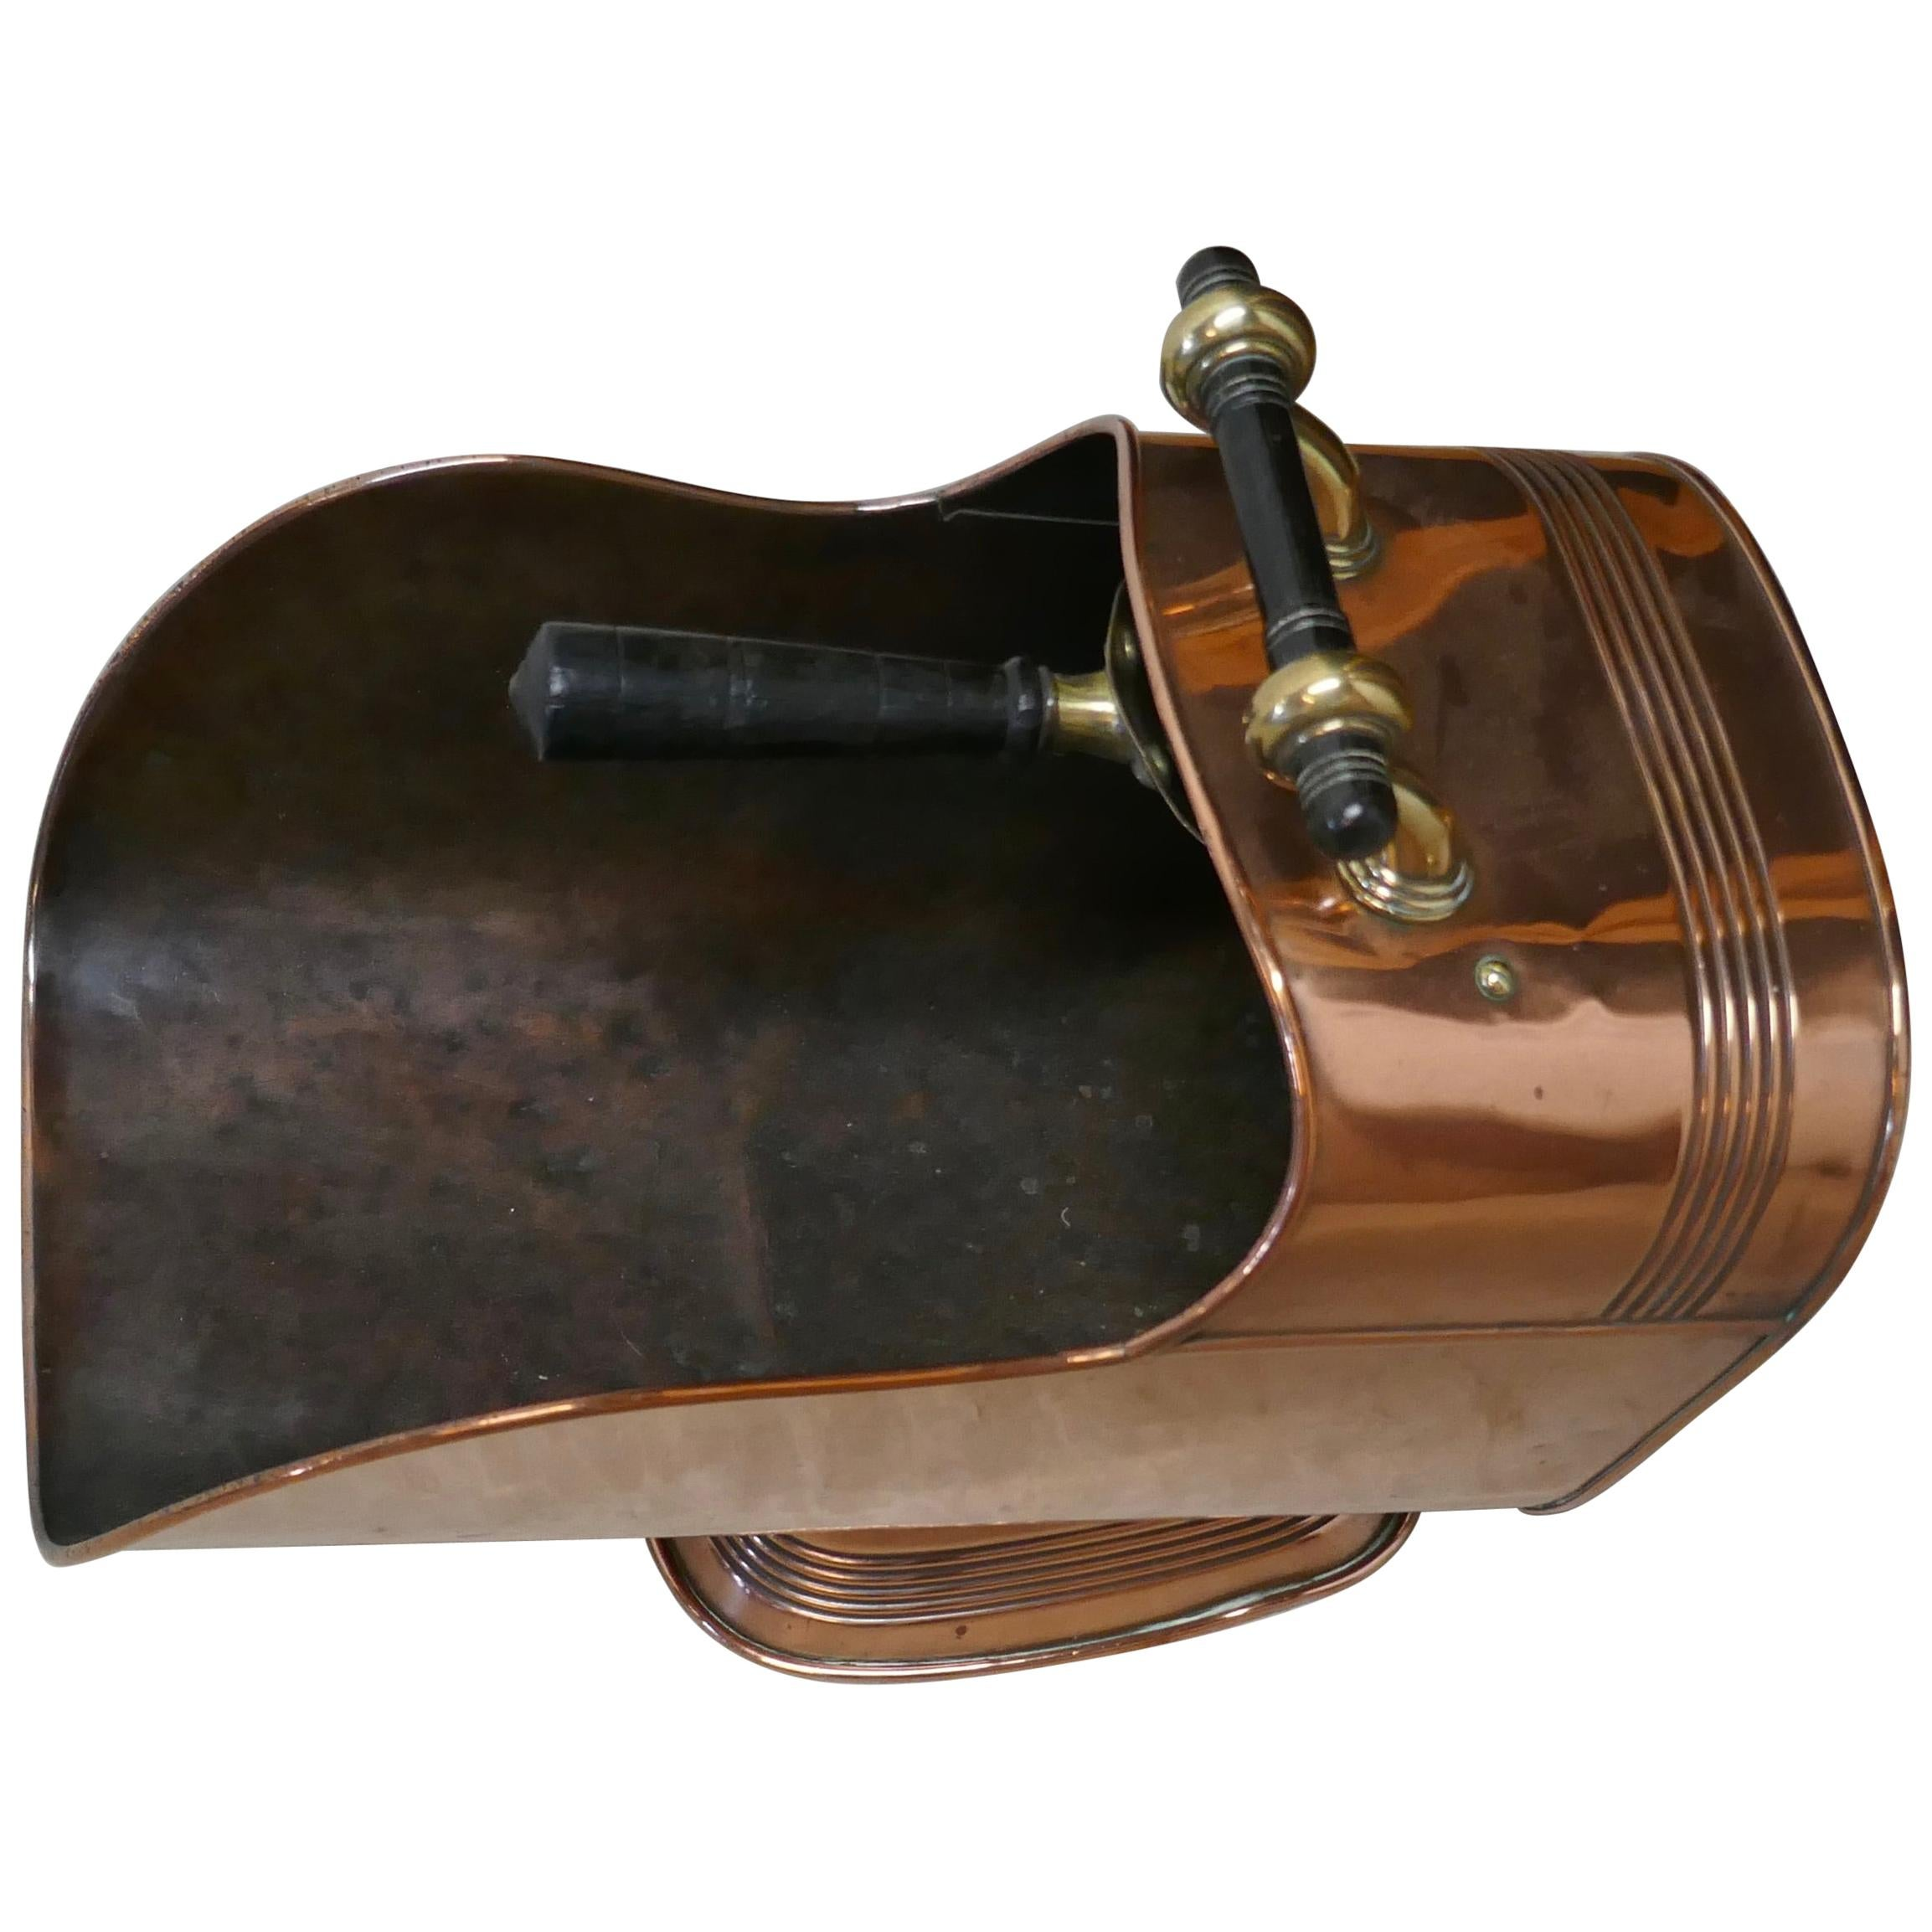 Superb Large Arts & Crafts Copper Helmet Coal Scuttle